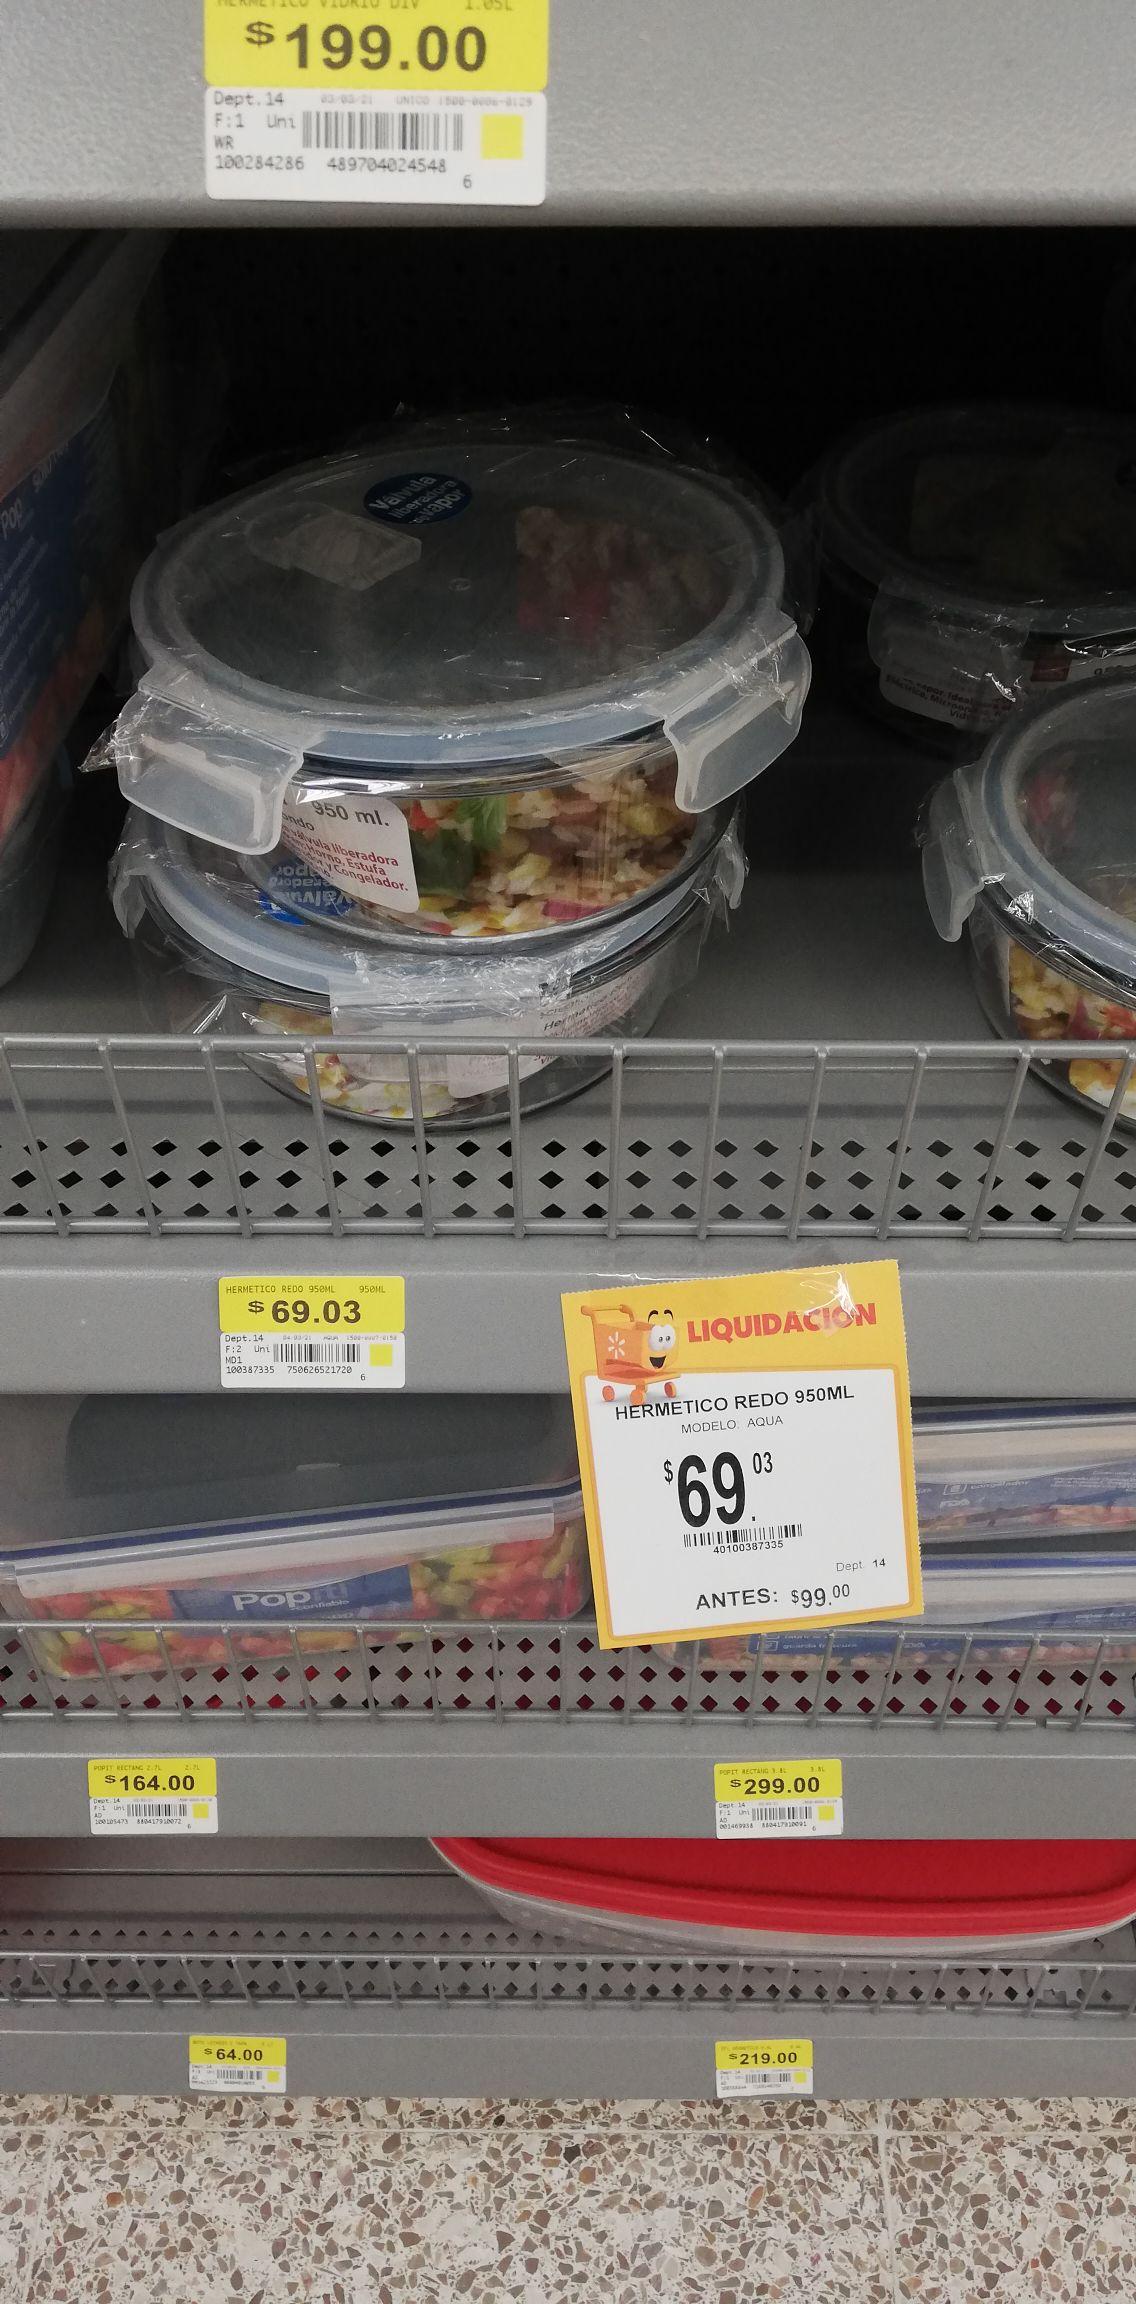 Walmart: Hermético redondo